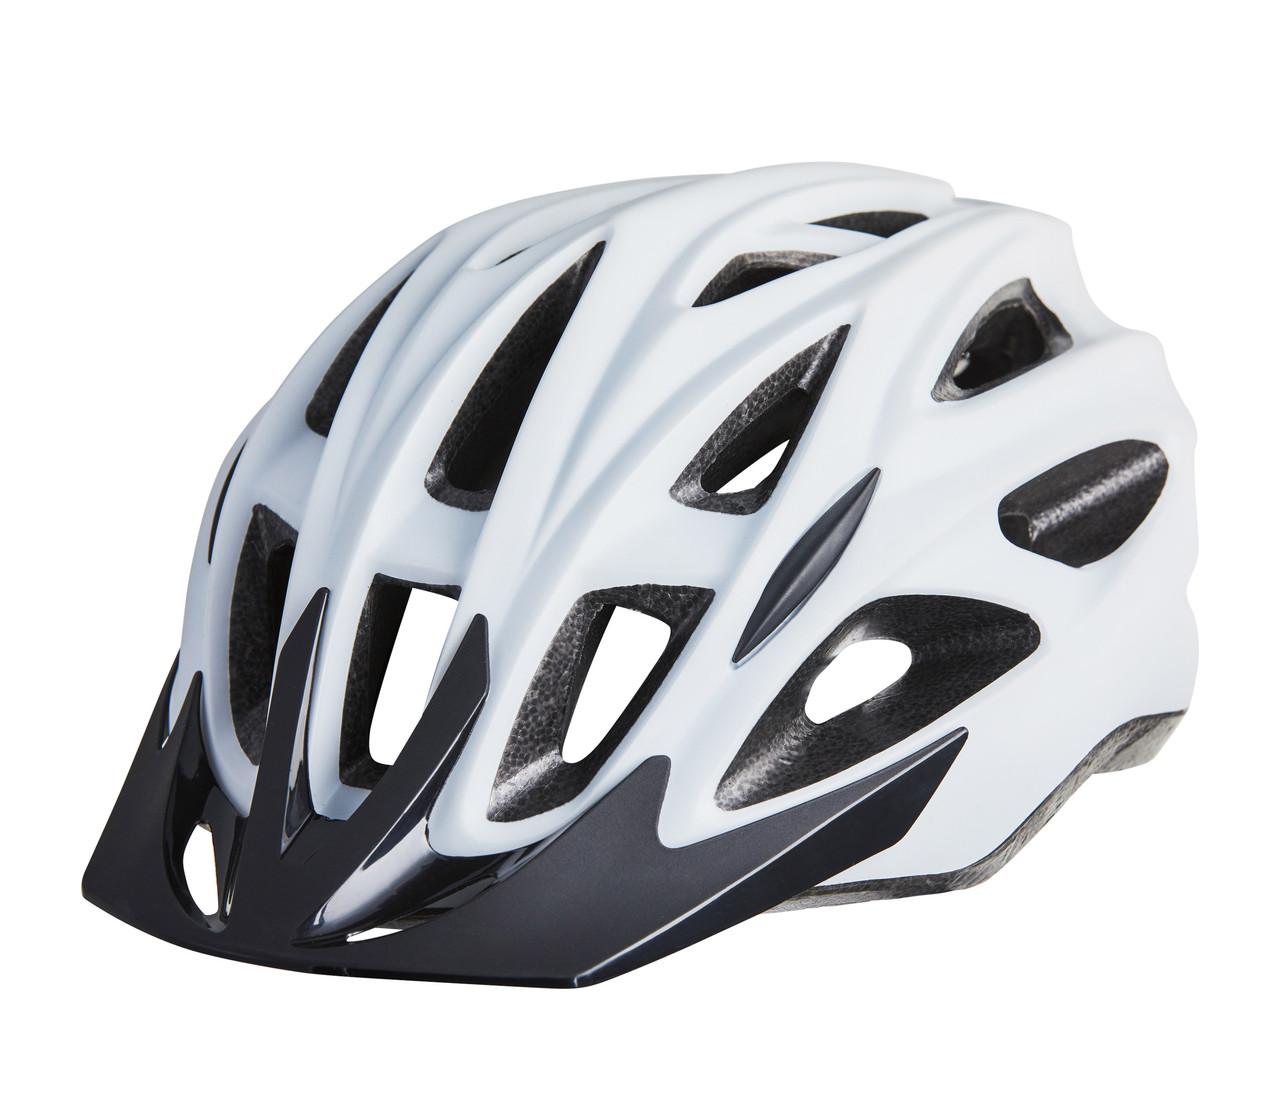 Шолом велосипедний Cannondale QUICK S/M 52-58 Білий